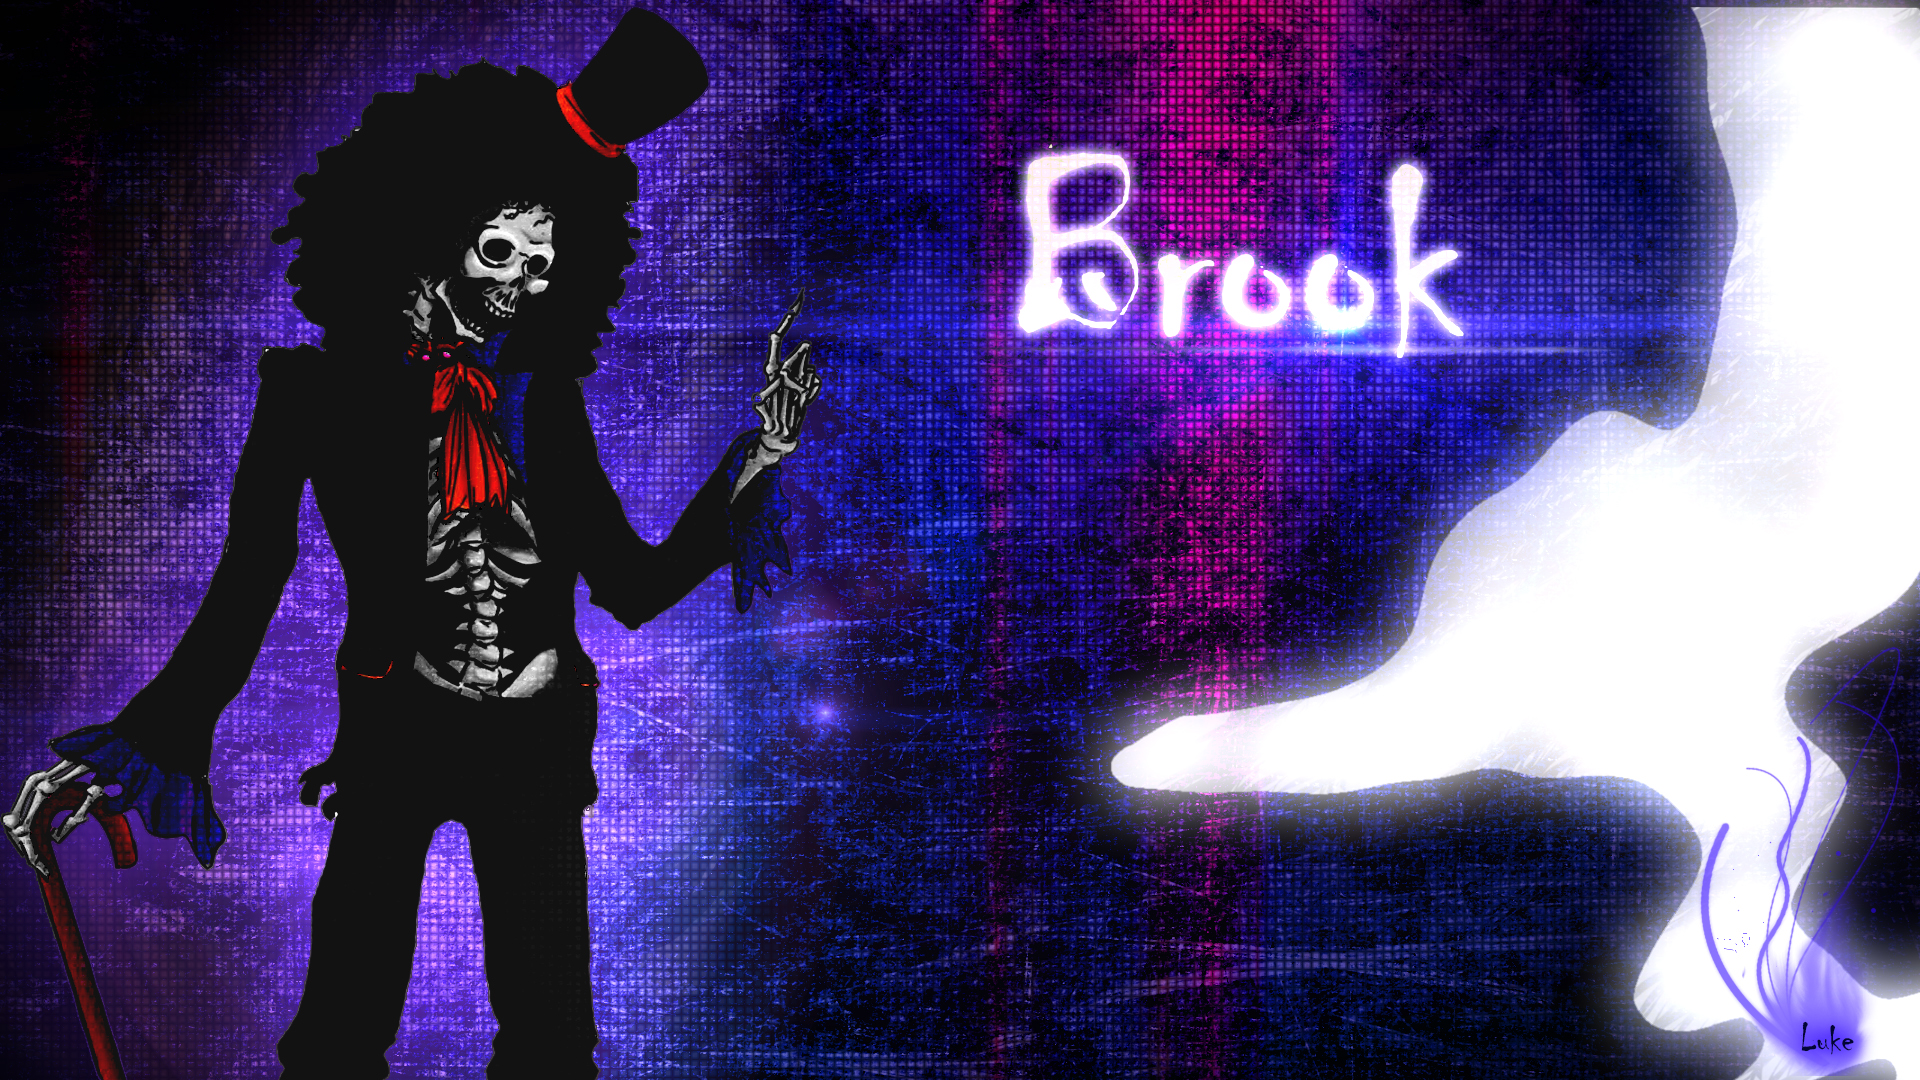 brook wallpaper hd by lukebpc customization wallpaper macabre horror 1920x1080